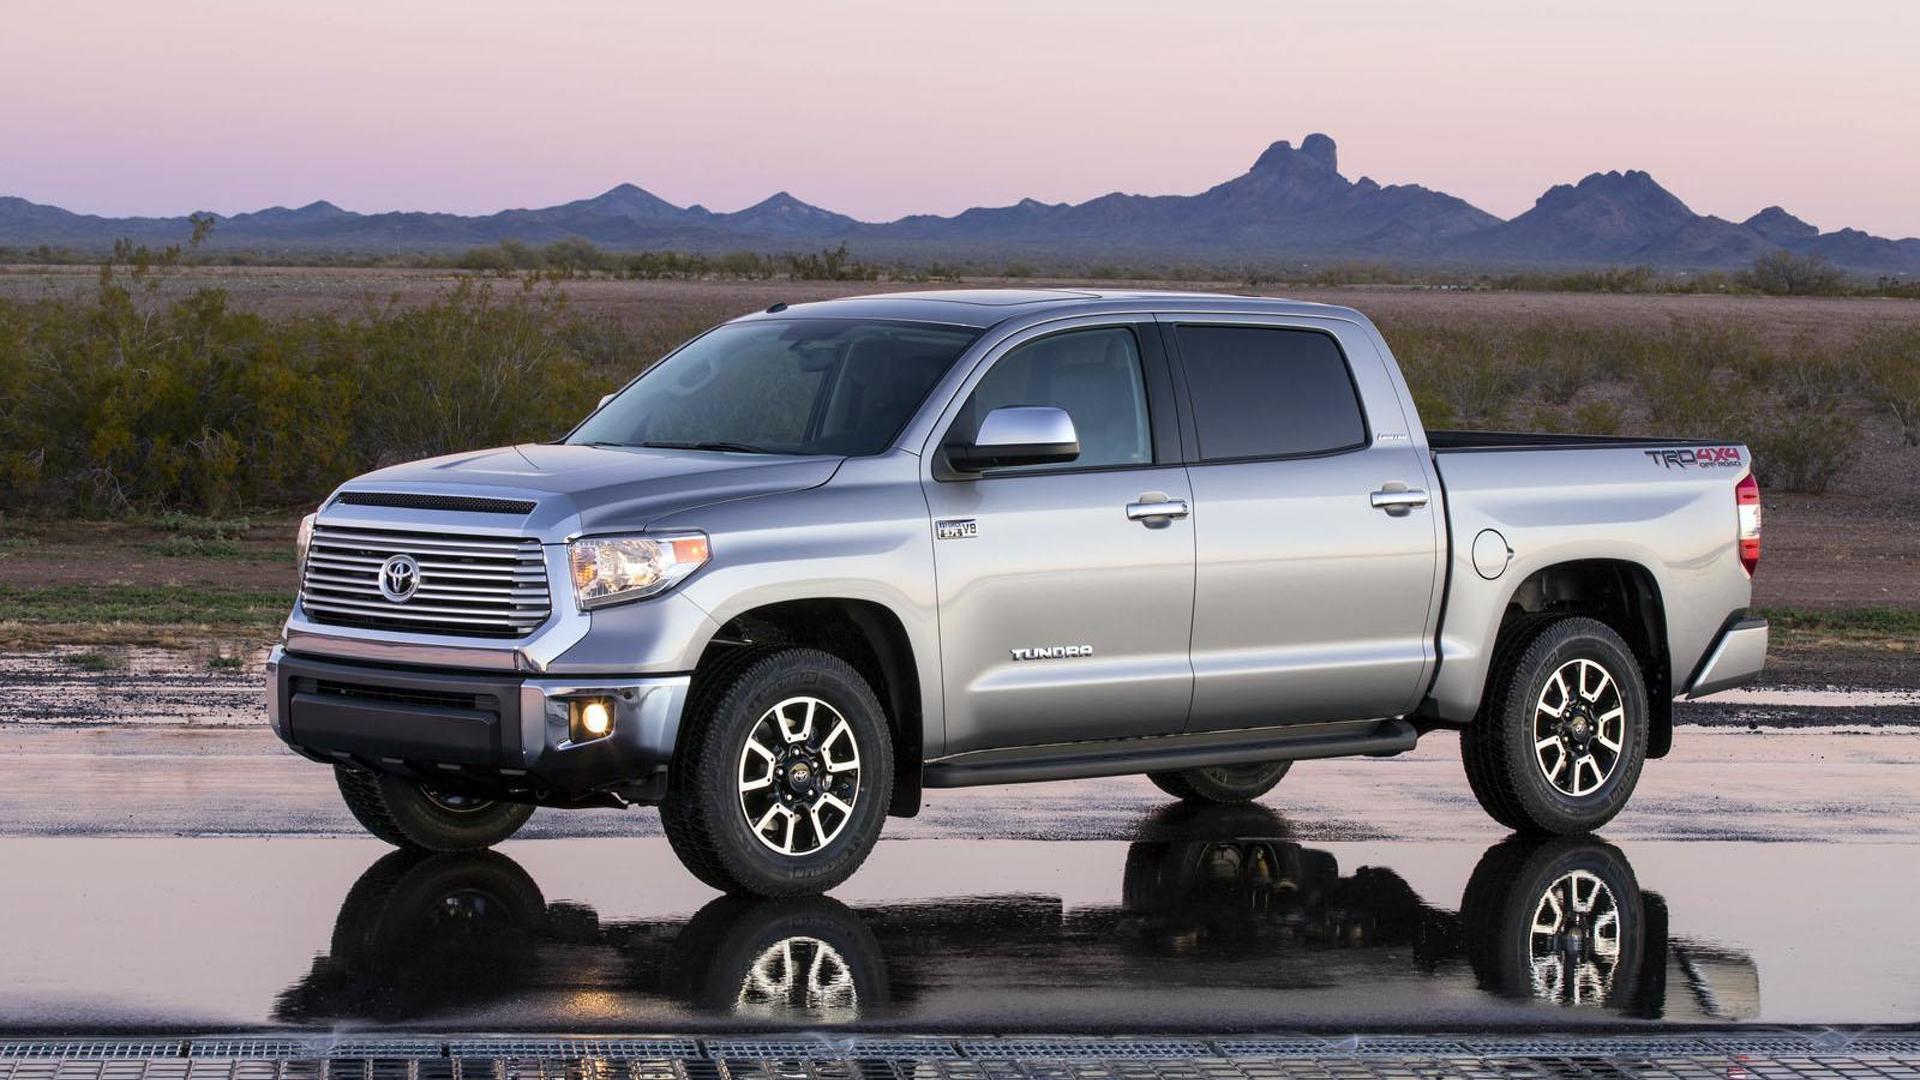 Toyota Tundra Cummins >> 2016 Toyota Tundra Could Offer A Cummins Turbodiesel Engine